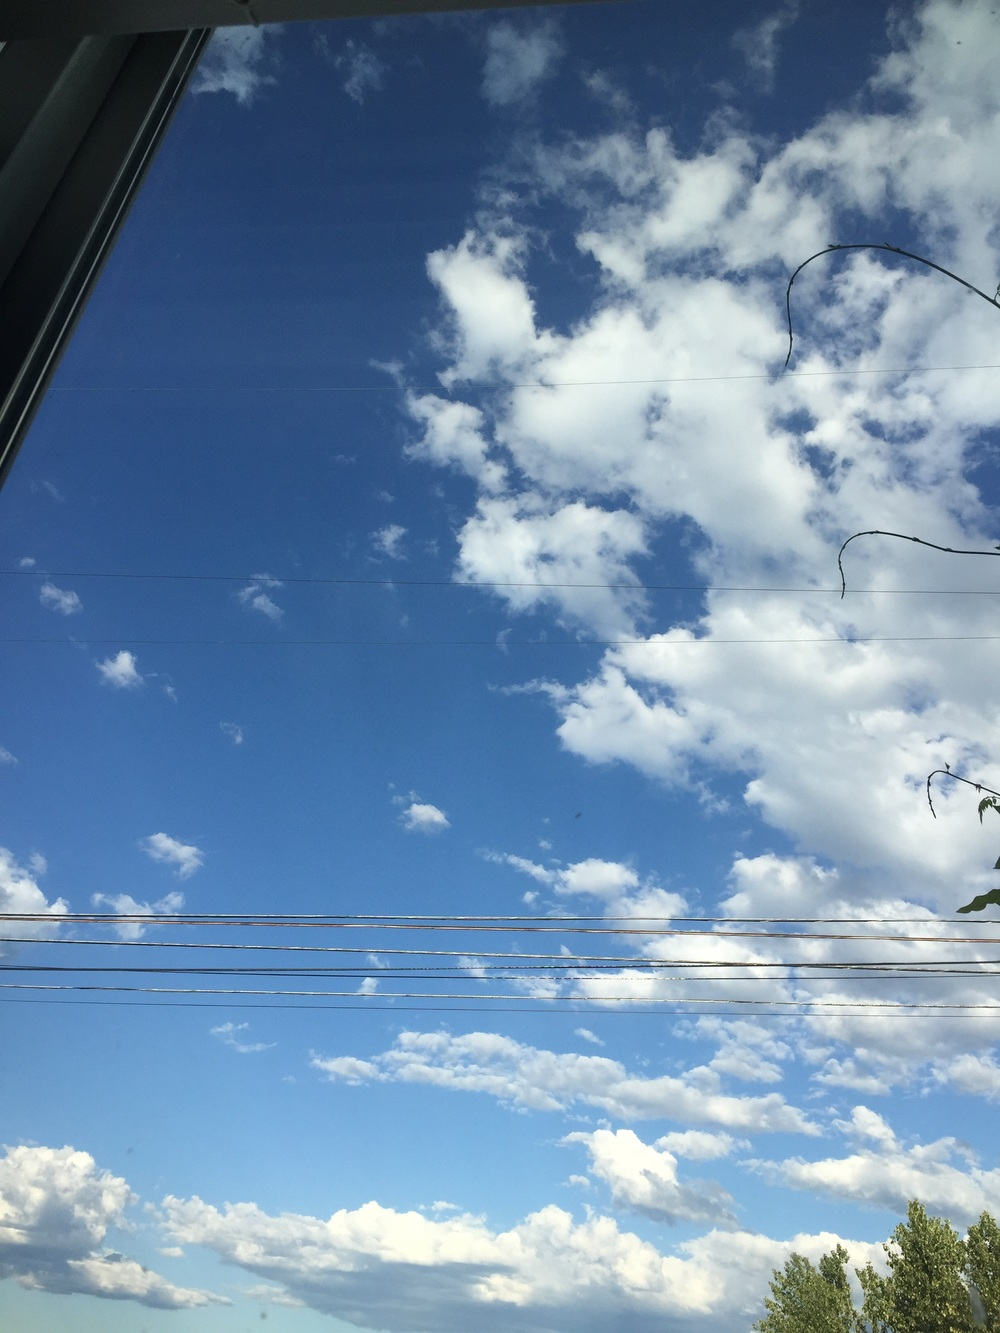 More sky. SO NICE.